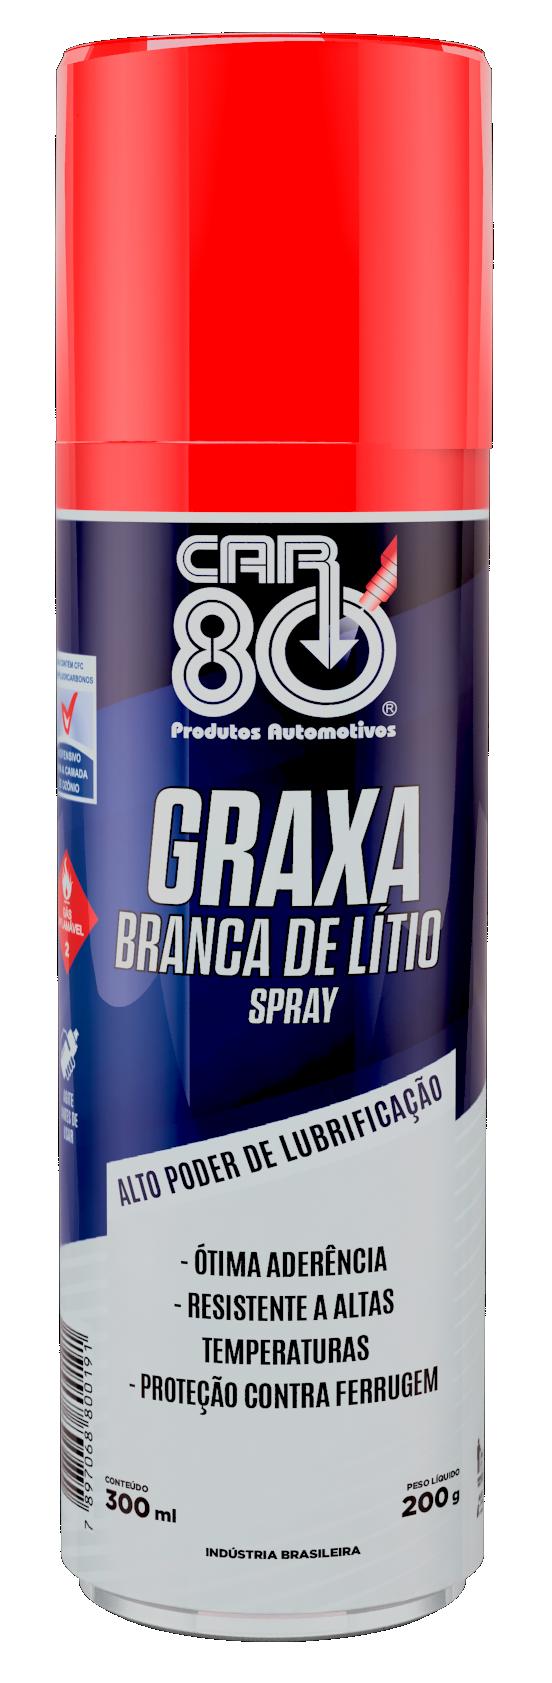 GRAXA BRANCA